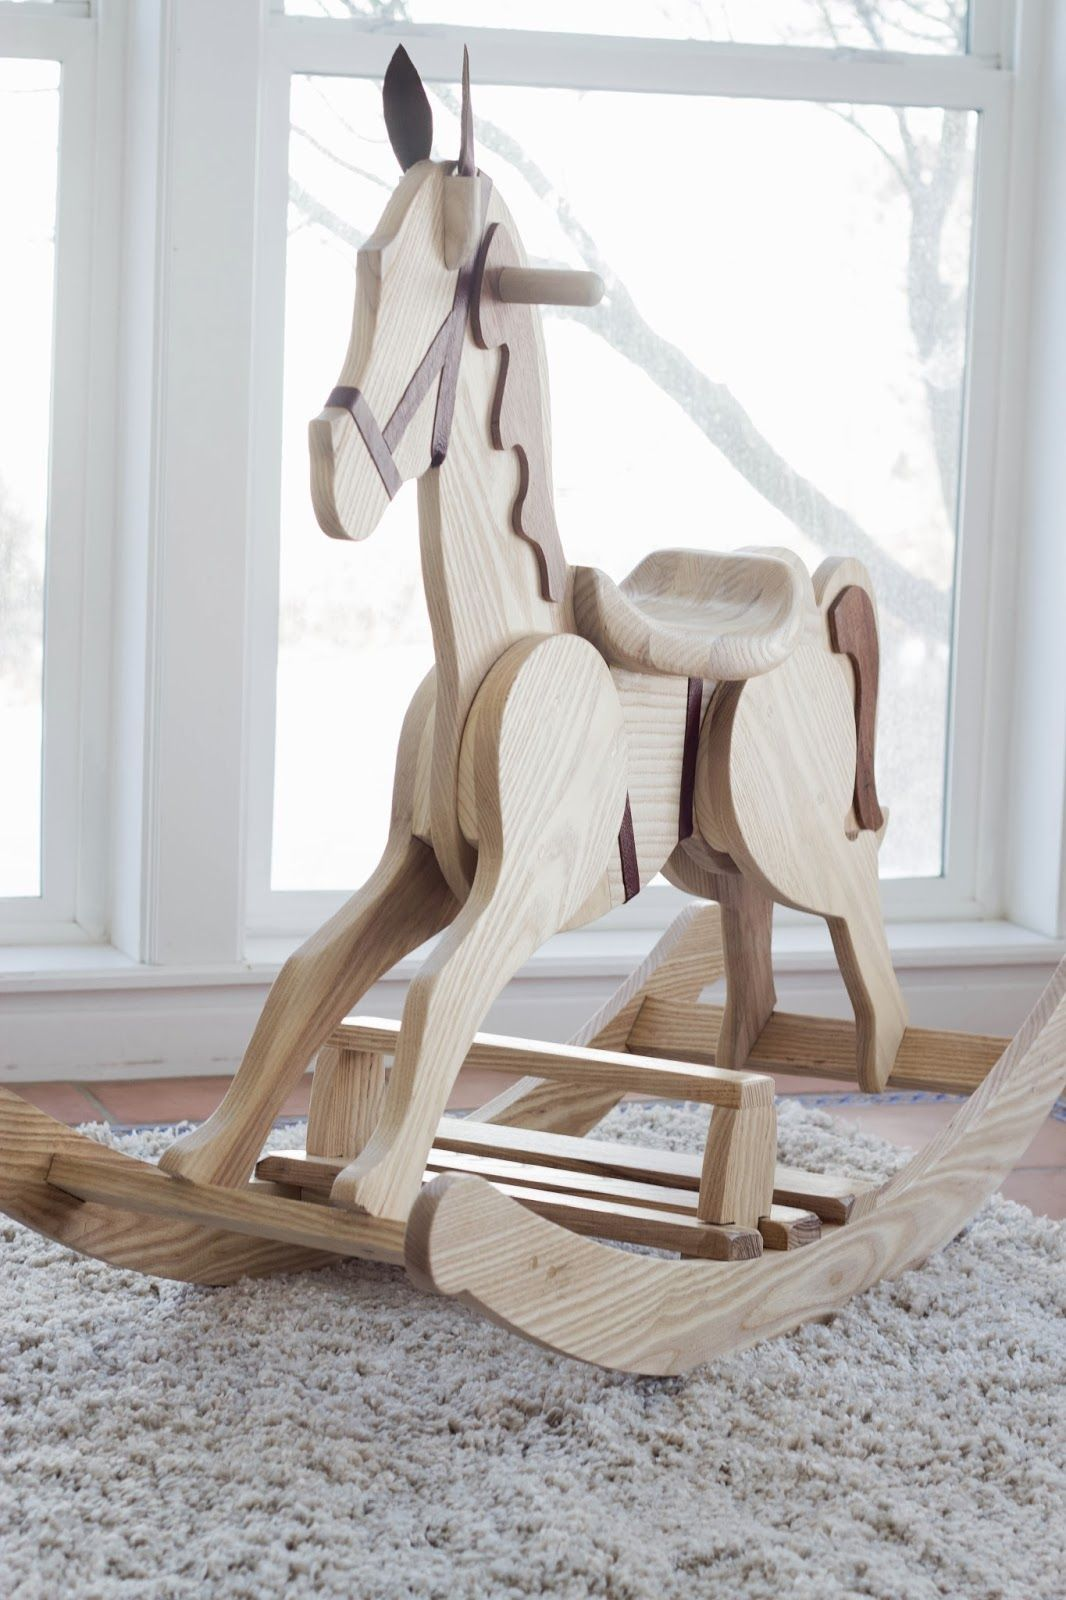 diy rocking horse do it yourself divas - Homemade Scooter Cover Horse Plans